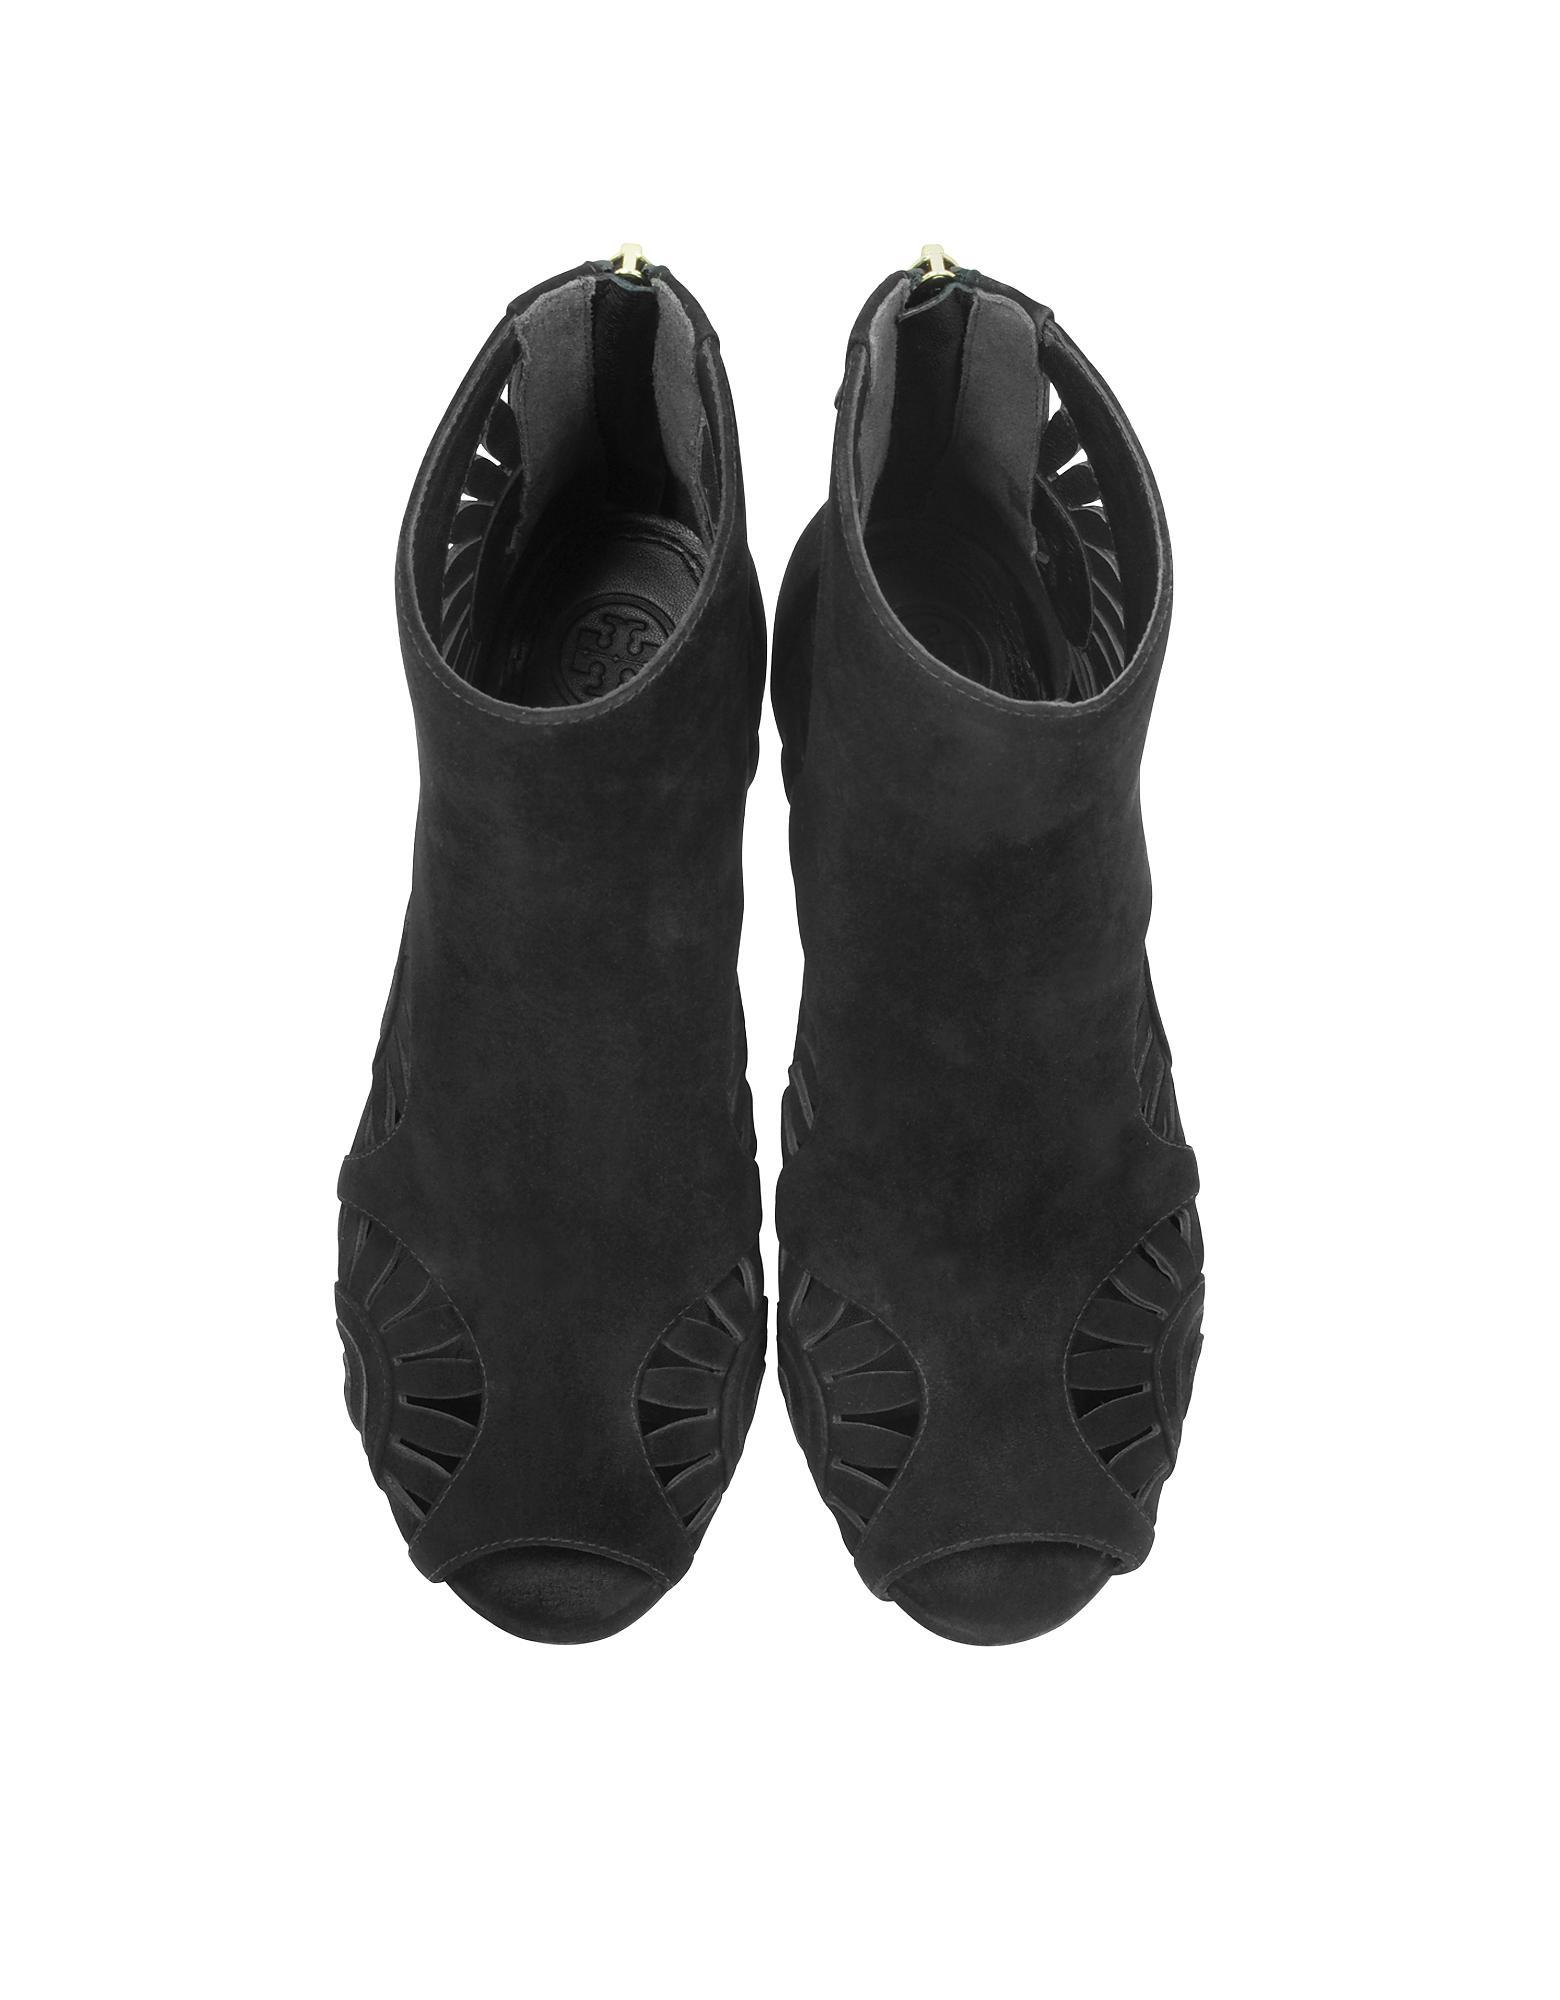 3d233f691 Lyst - Tory Burch Leyla Black Suede Heel Bootie in Black